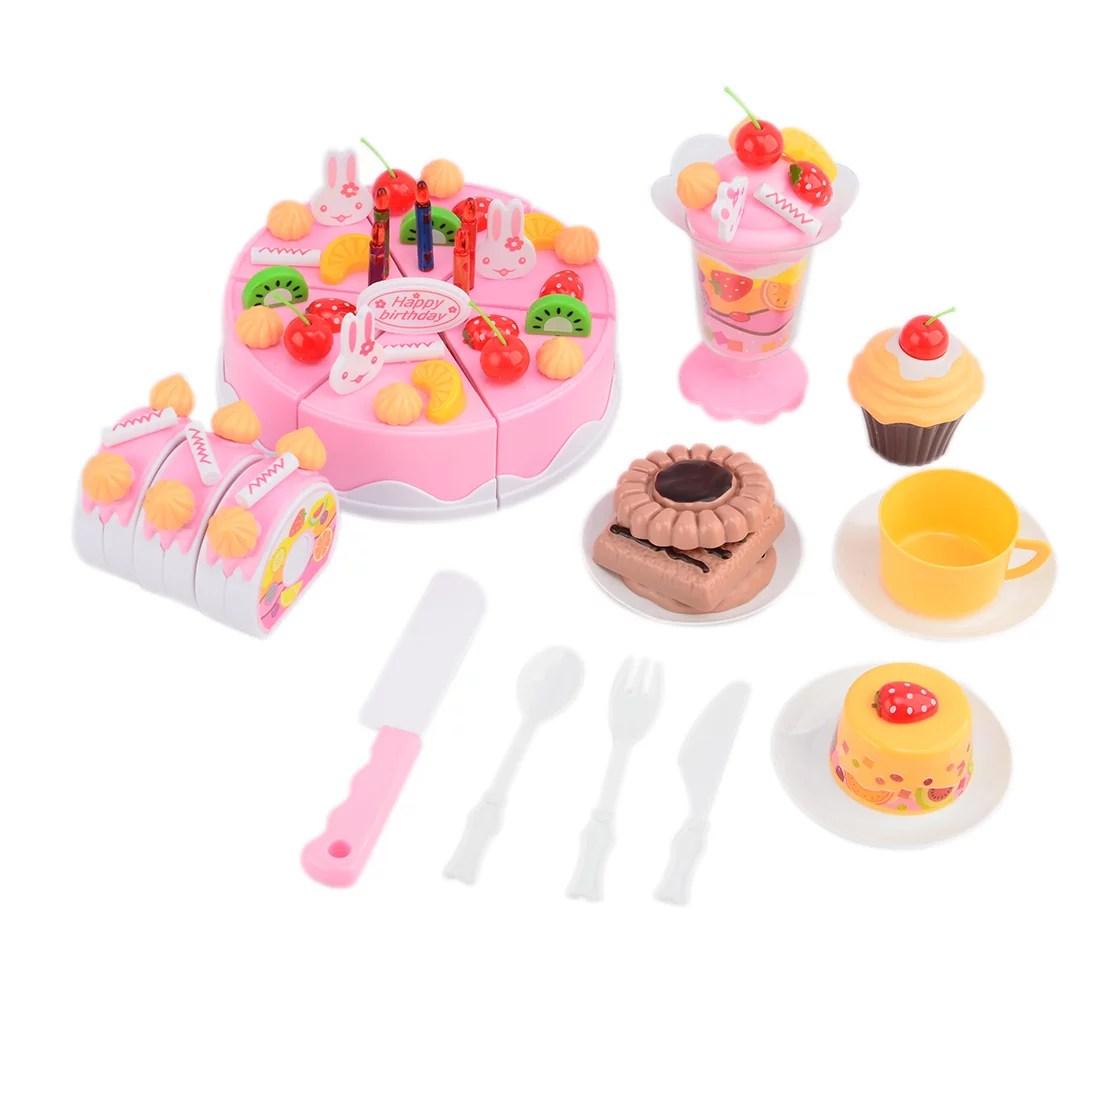 Set Of 75pcs Plastic Kitchen Cutting Toy Birthday Cake